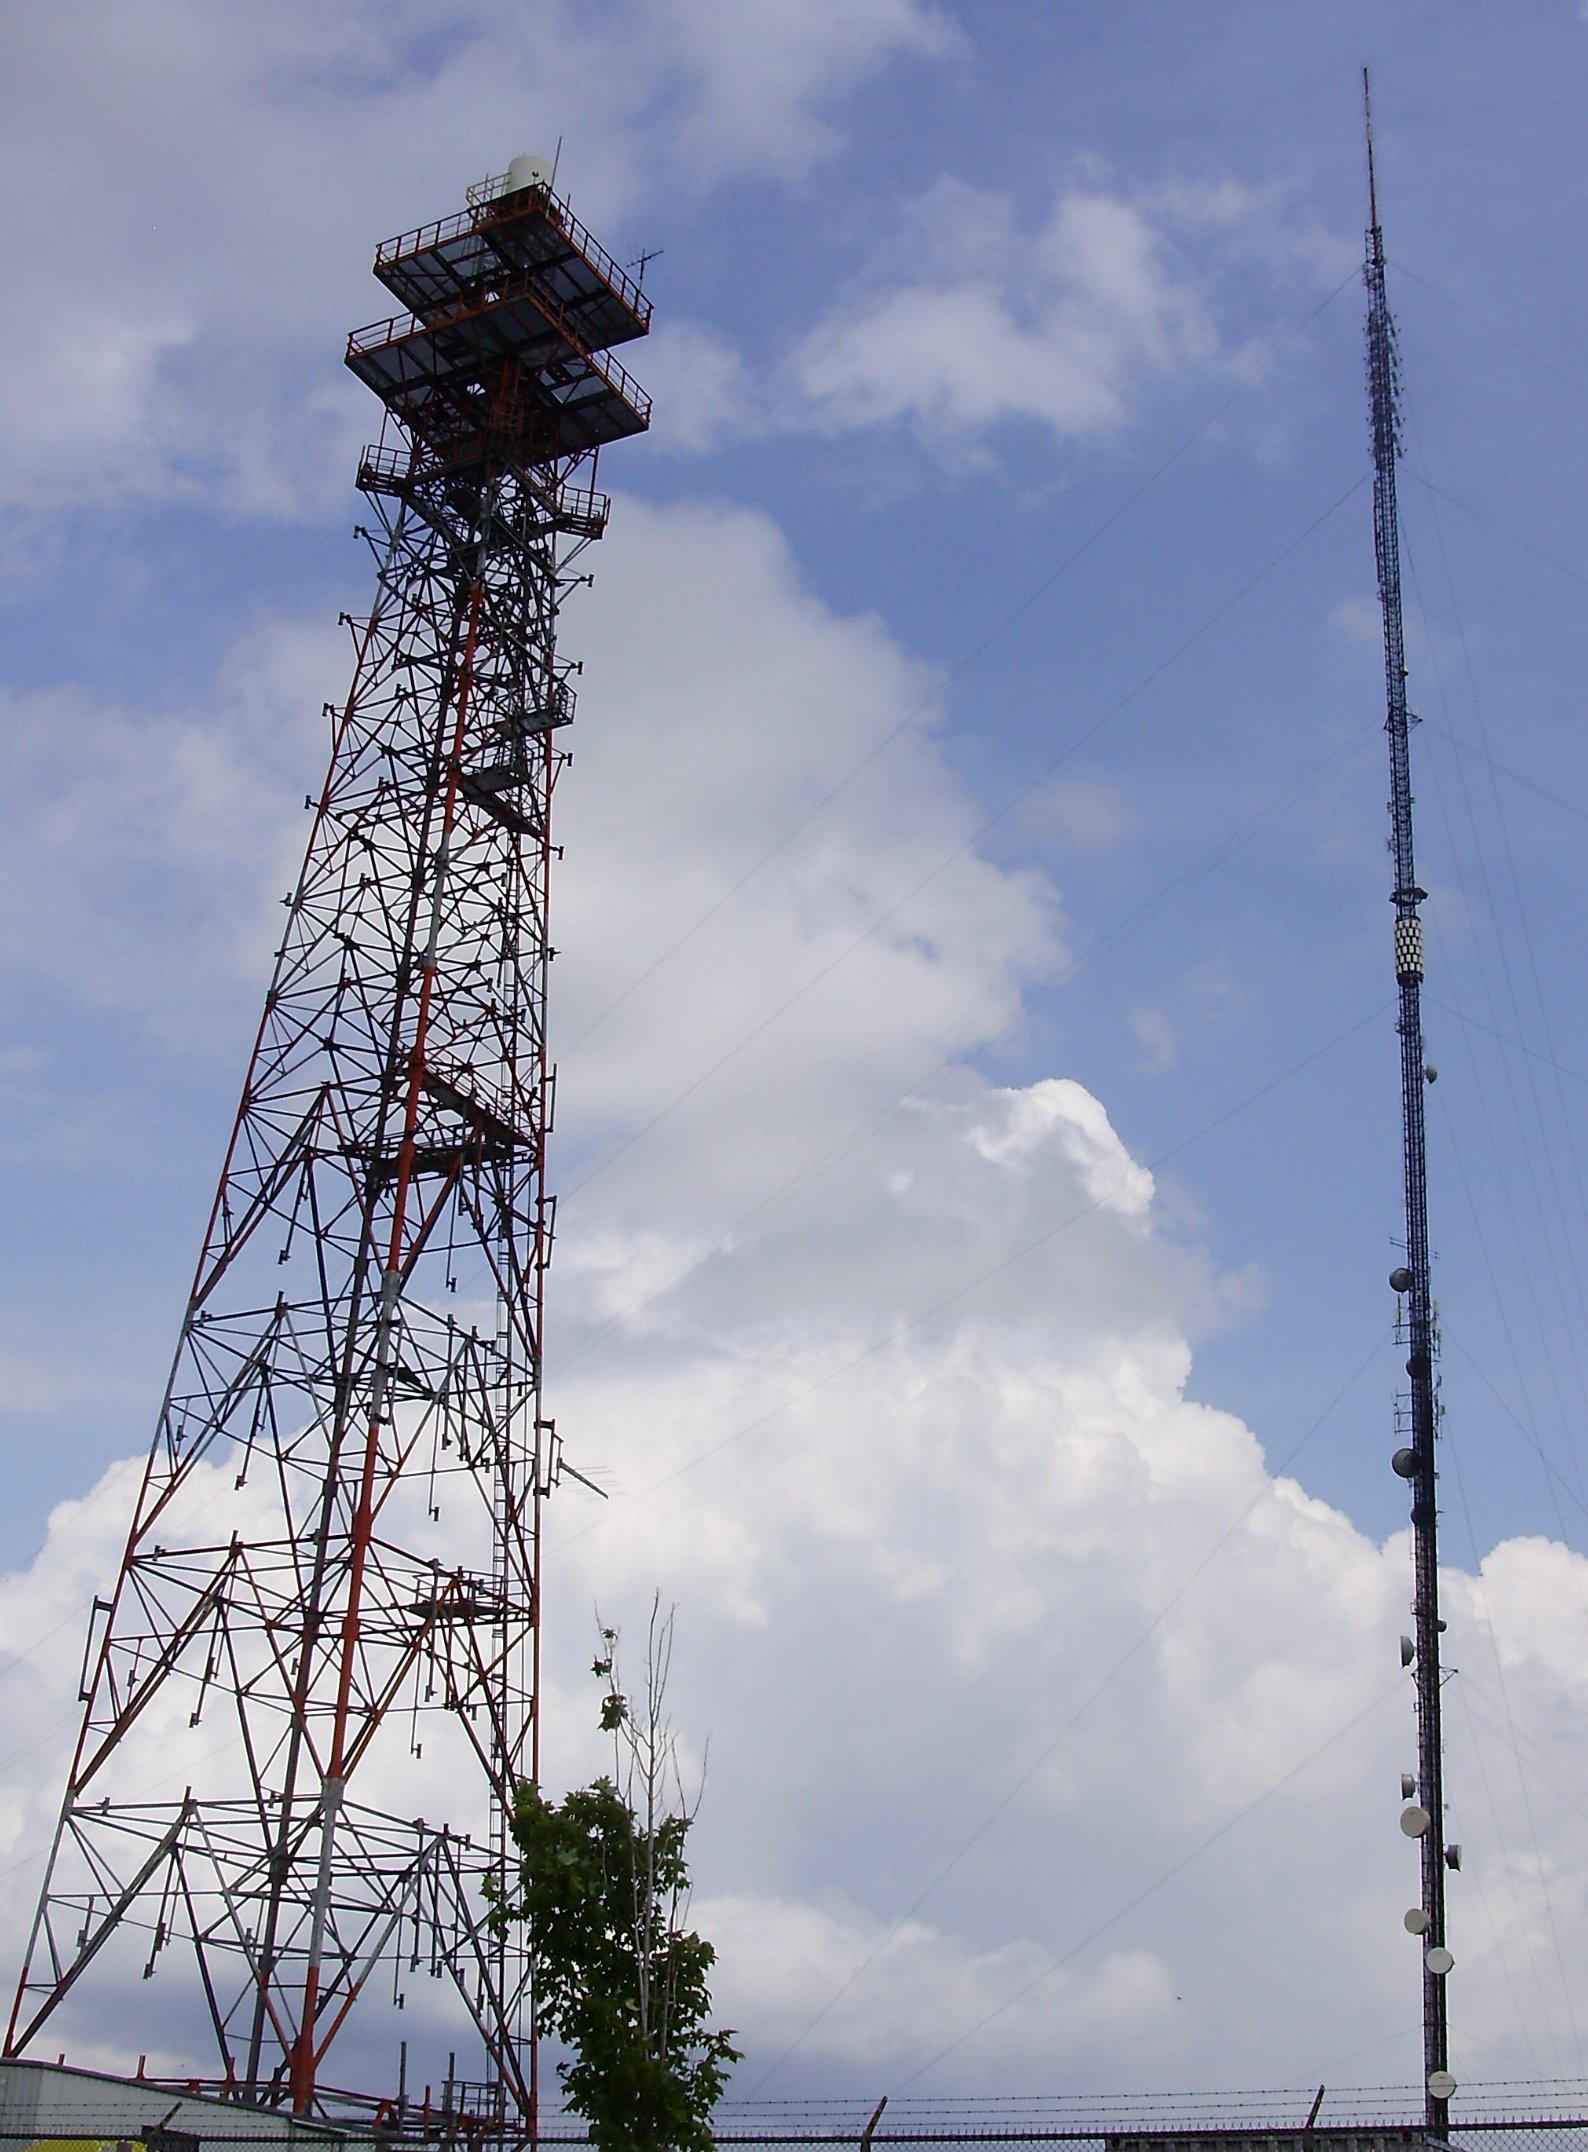 File:CKVR-TV Towers.jpg - Wikimedia Commons